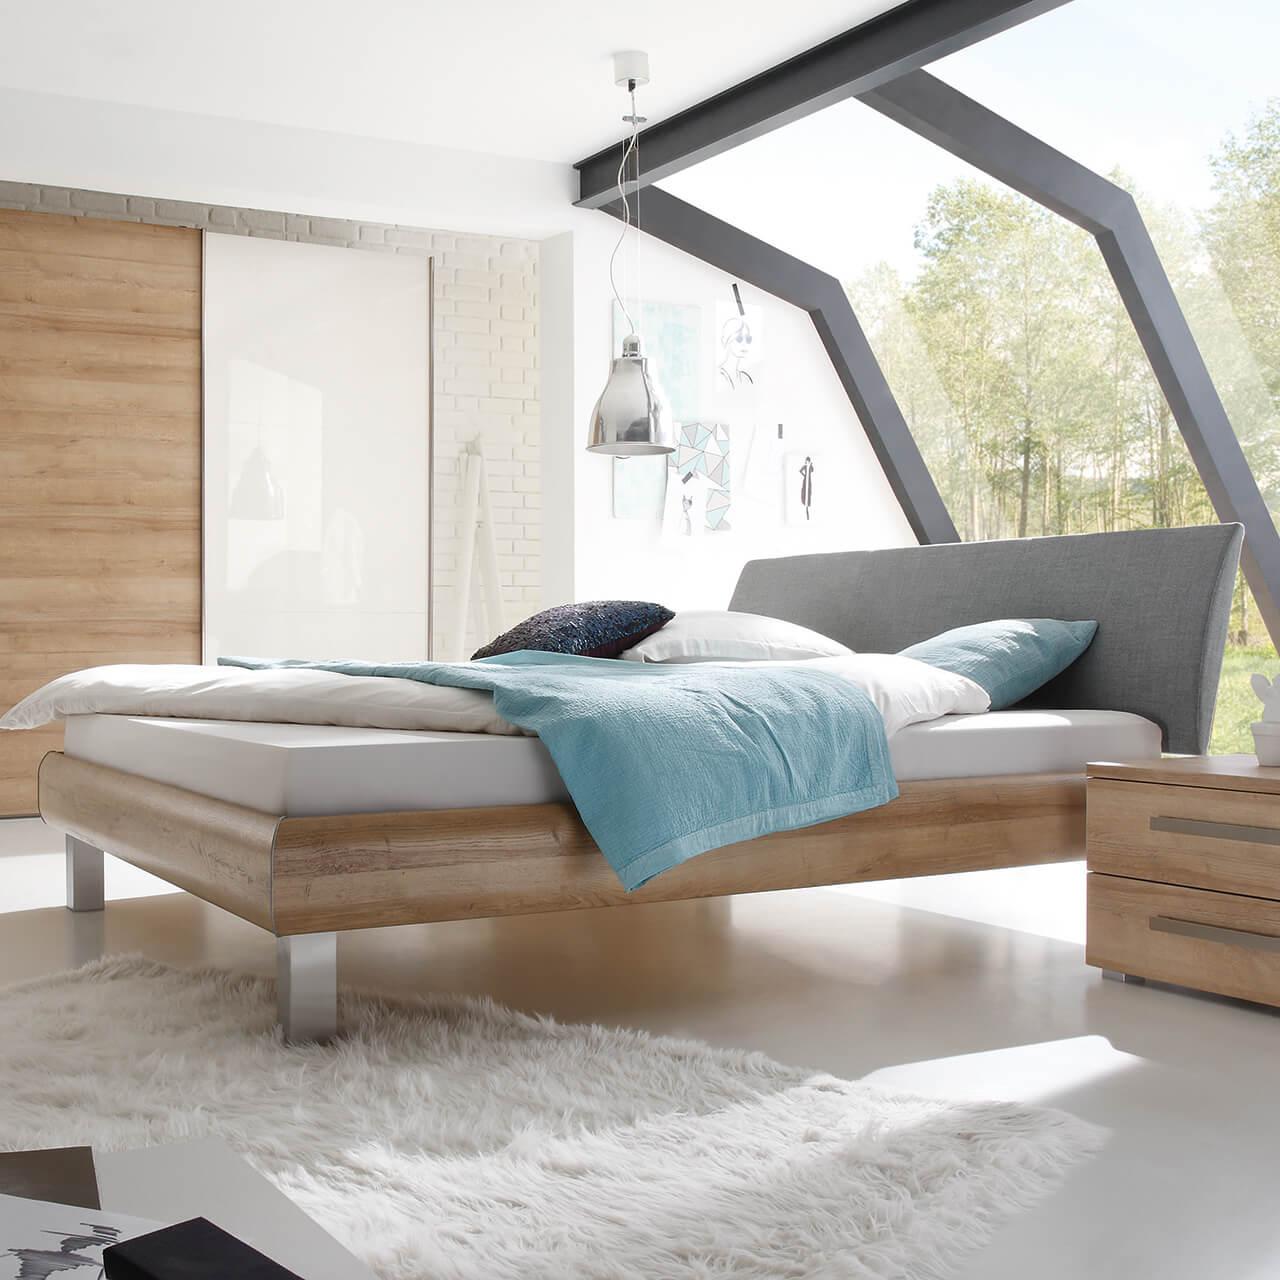 deko bettrahmen suma wasserbetten. Black Bedroom Furniture Sets. Home Design Ideas